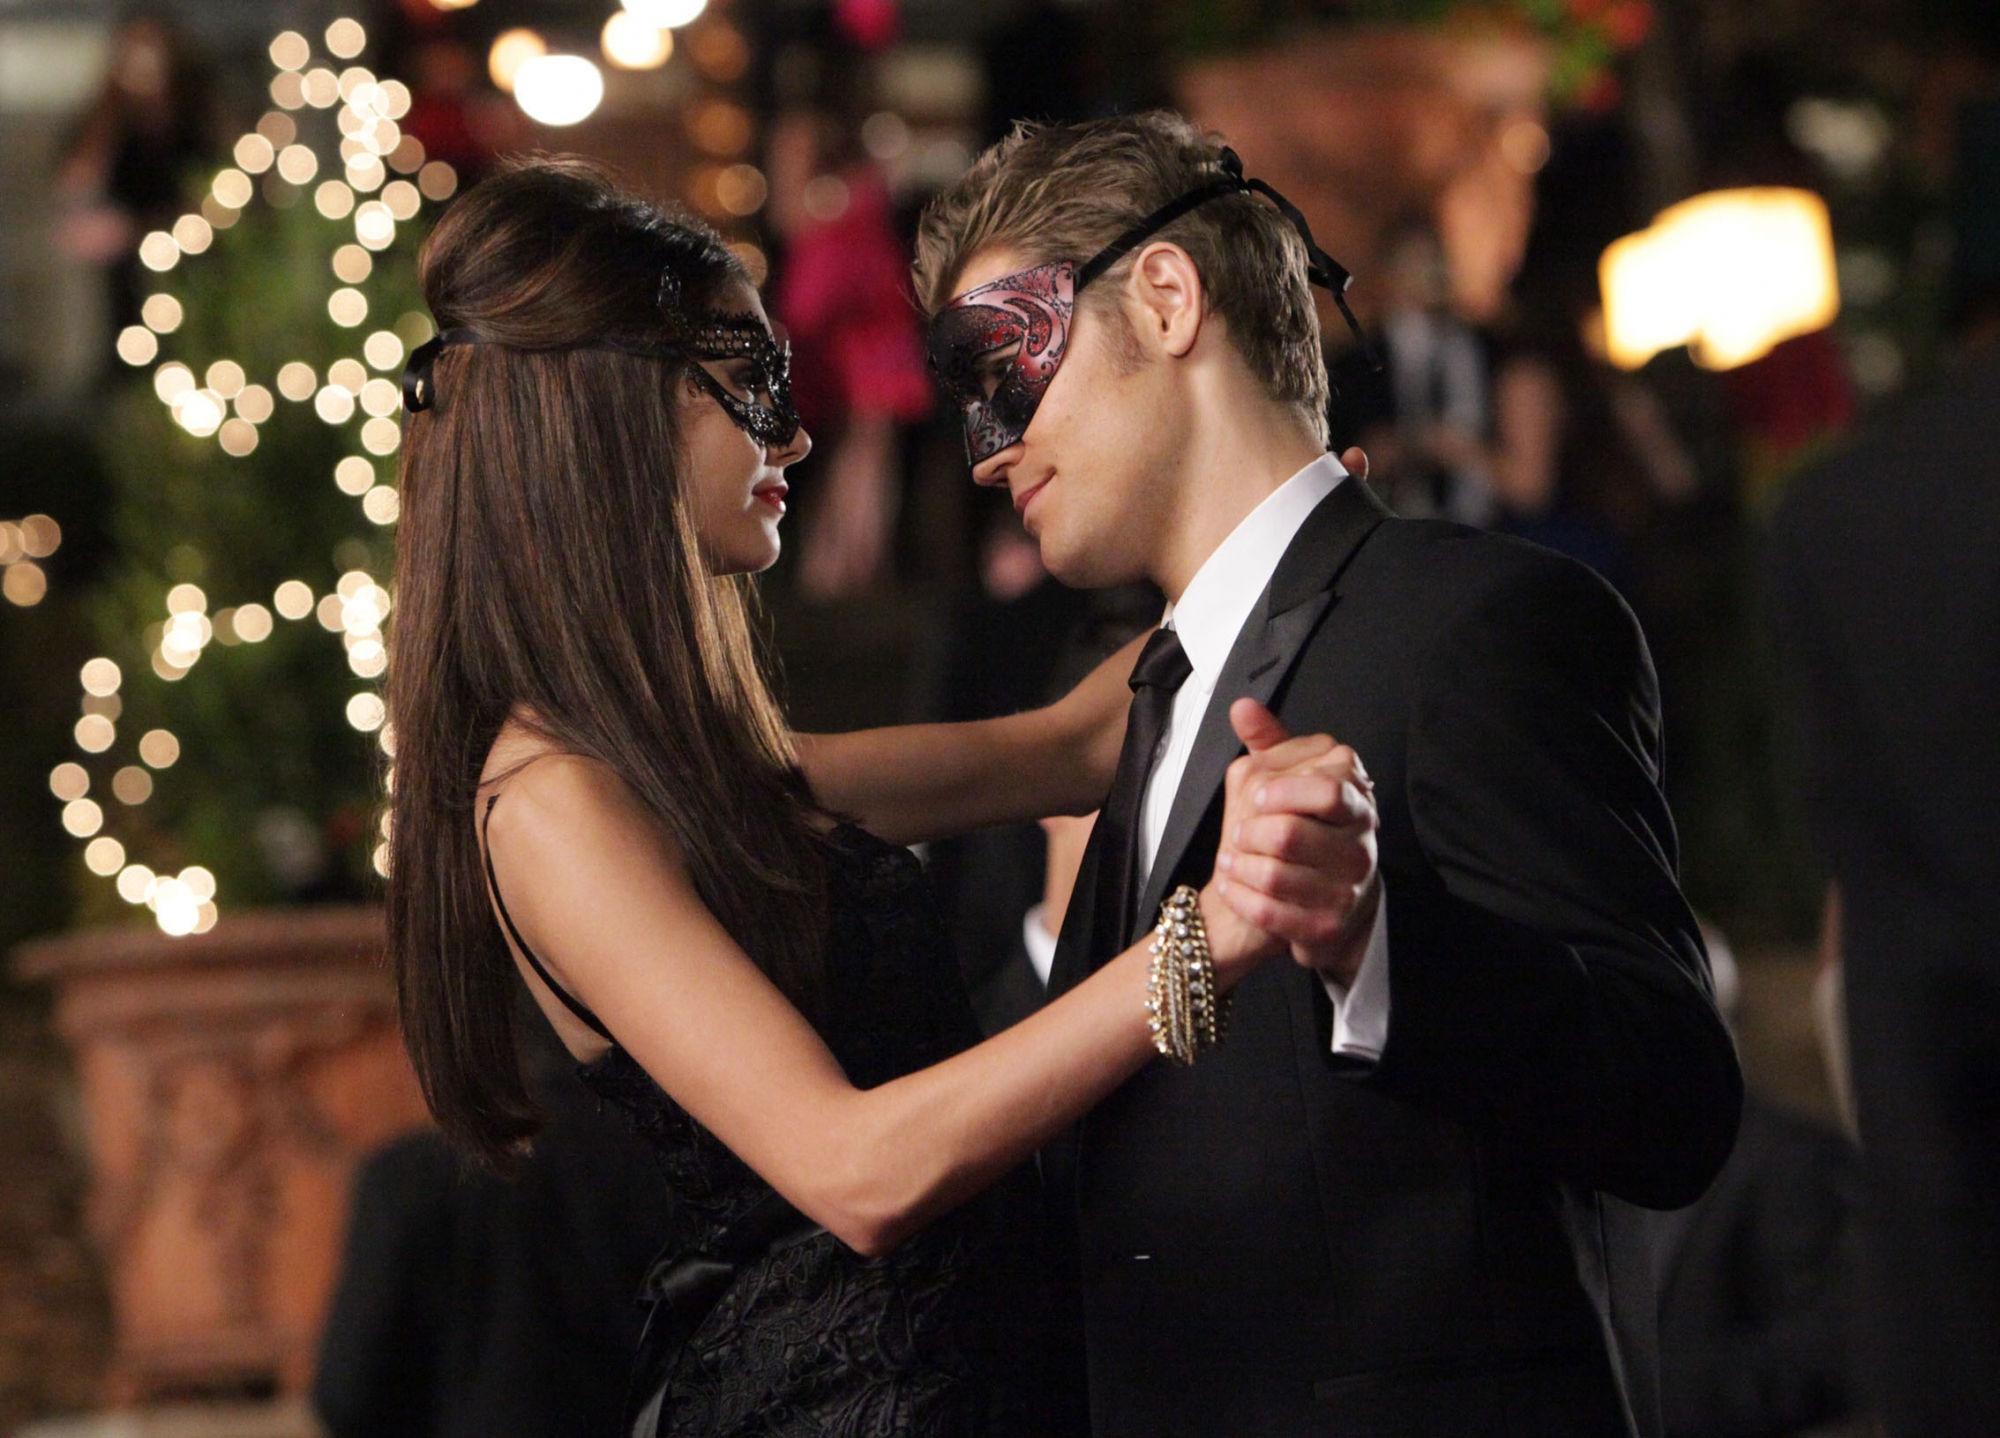 Masquerade Ball The Vampire Diaries Wiki Fandom 2000x1438